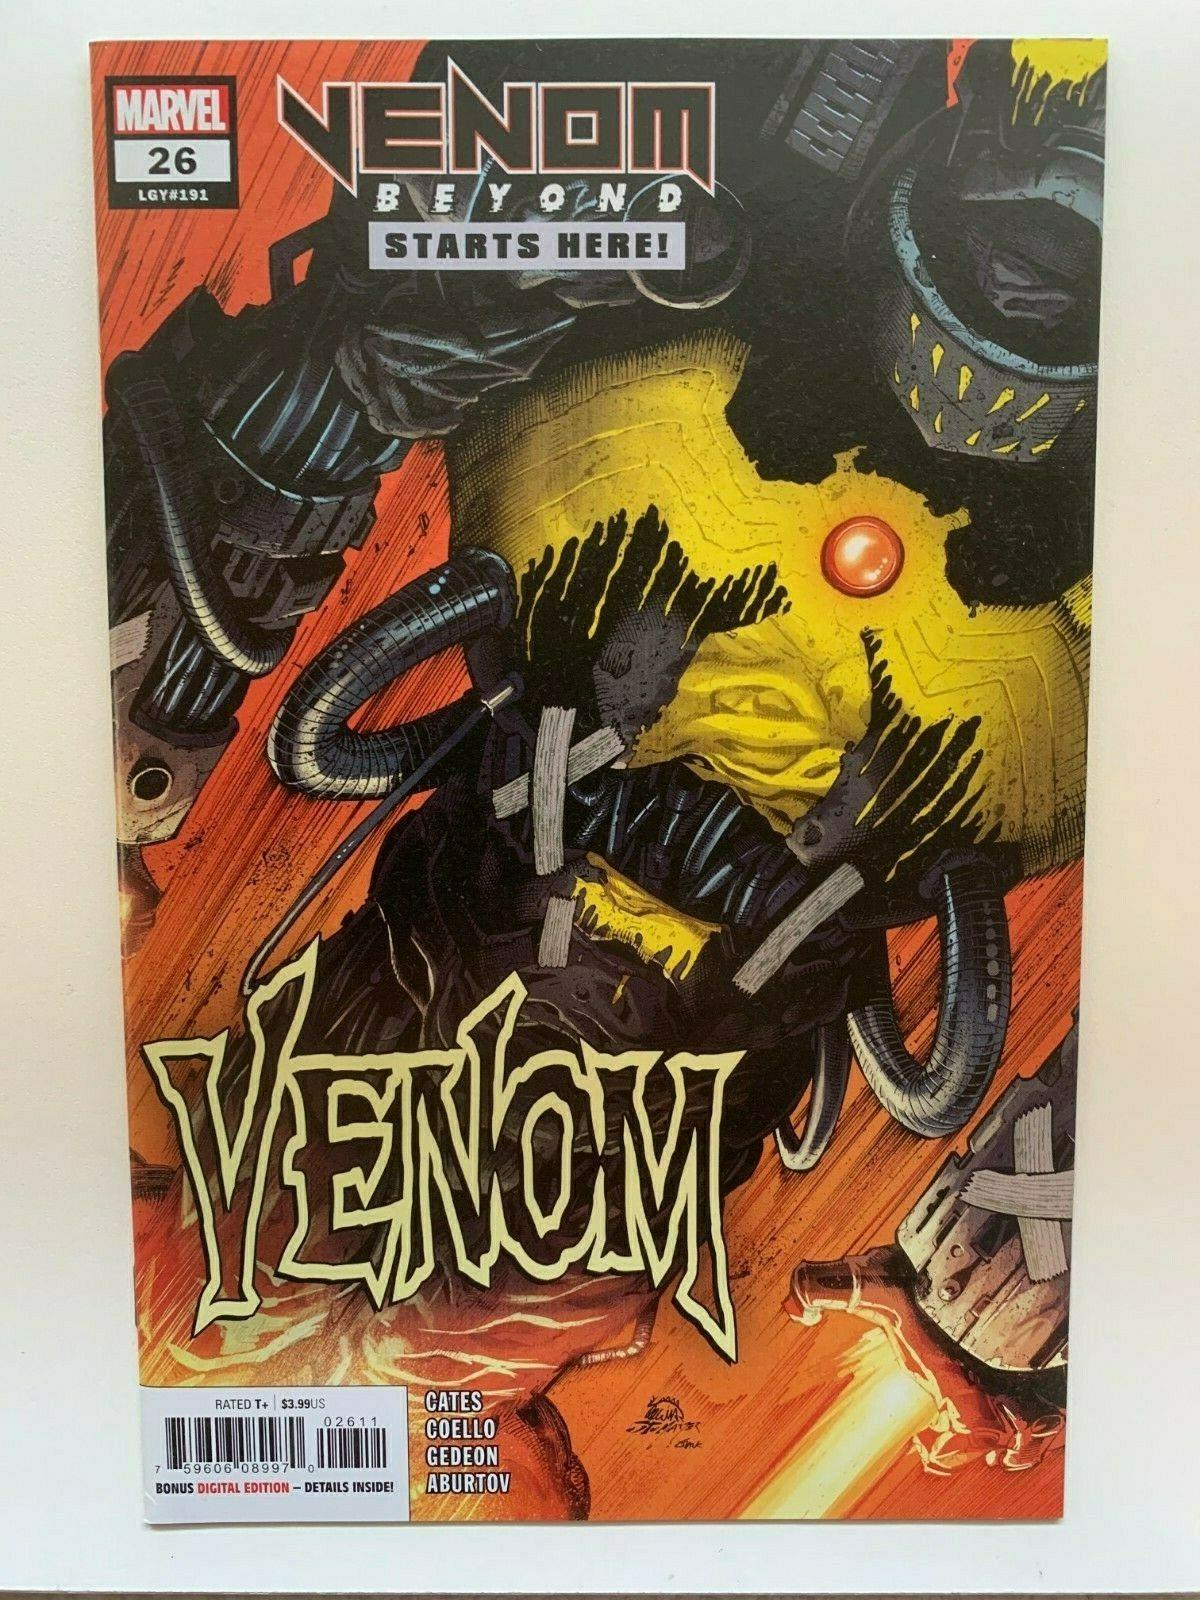 Venom #27 2020 Unread 1st Print Stegman Main Cover Marvel Comics Donny Cates